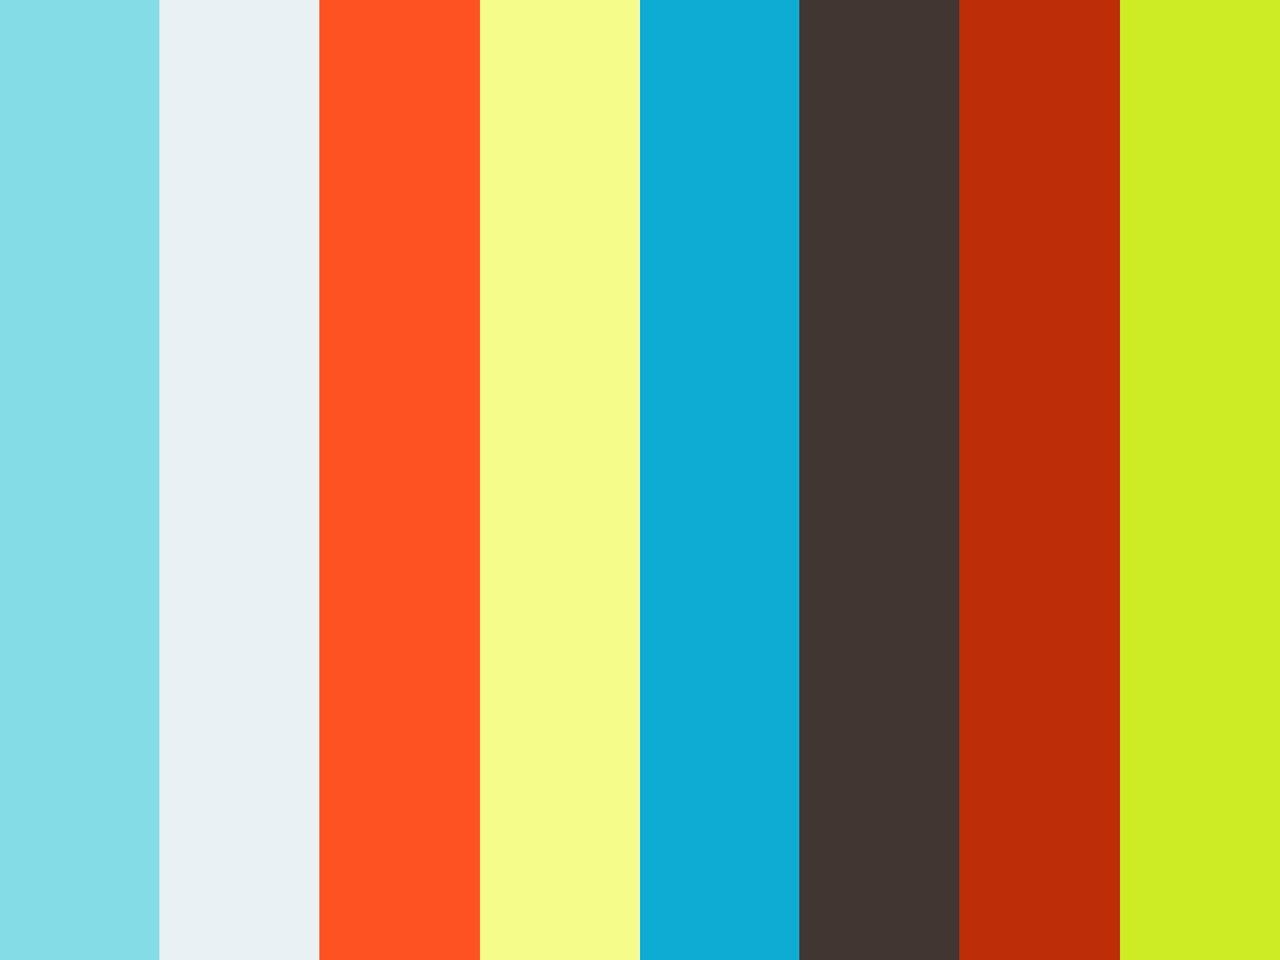 Colorist Showreel 2015 - Ola Bäccman